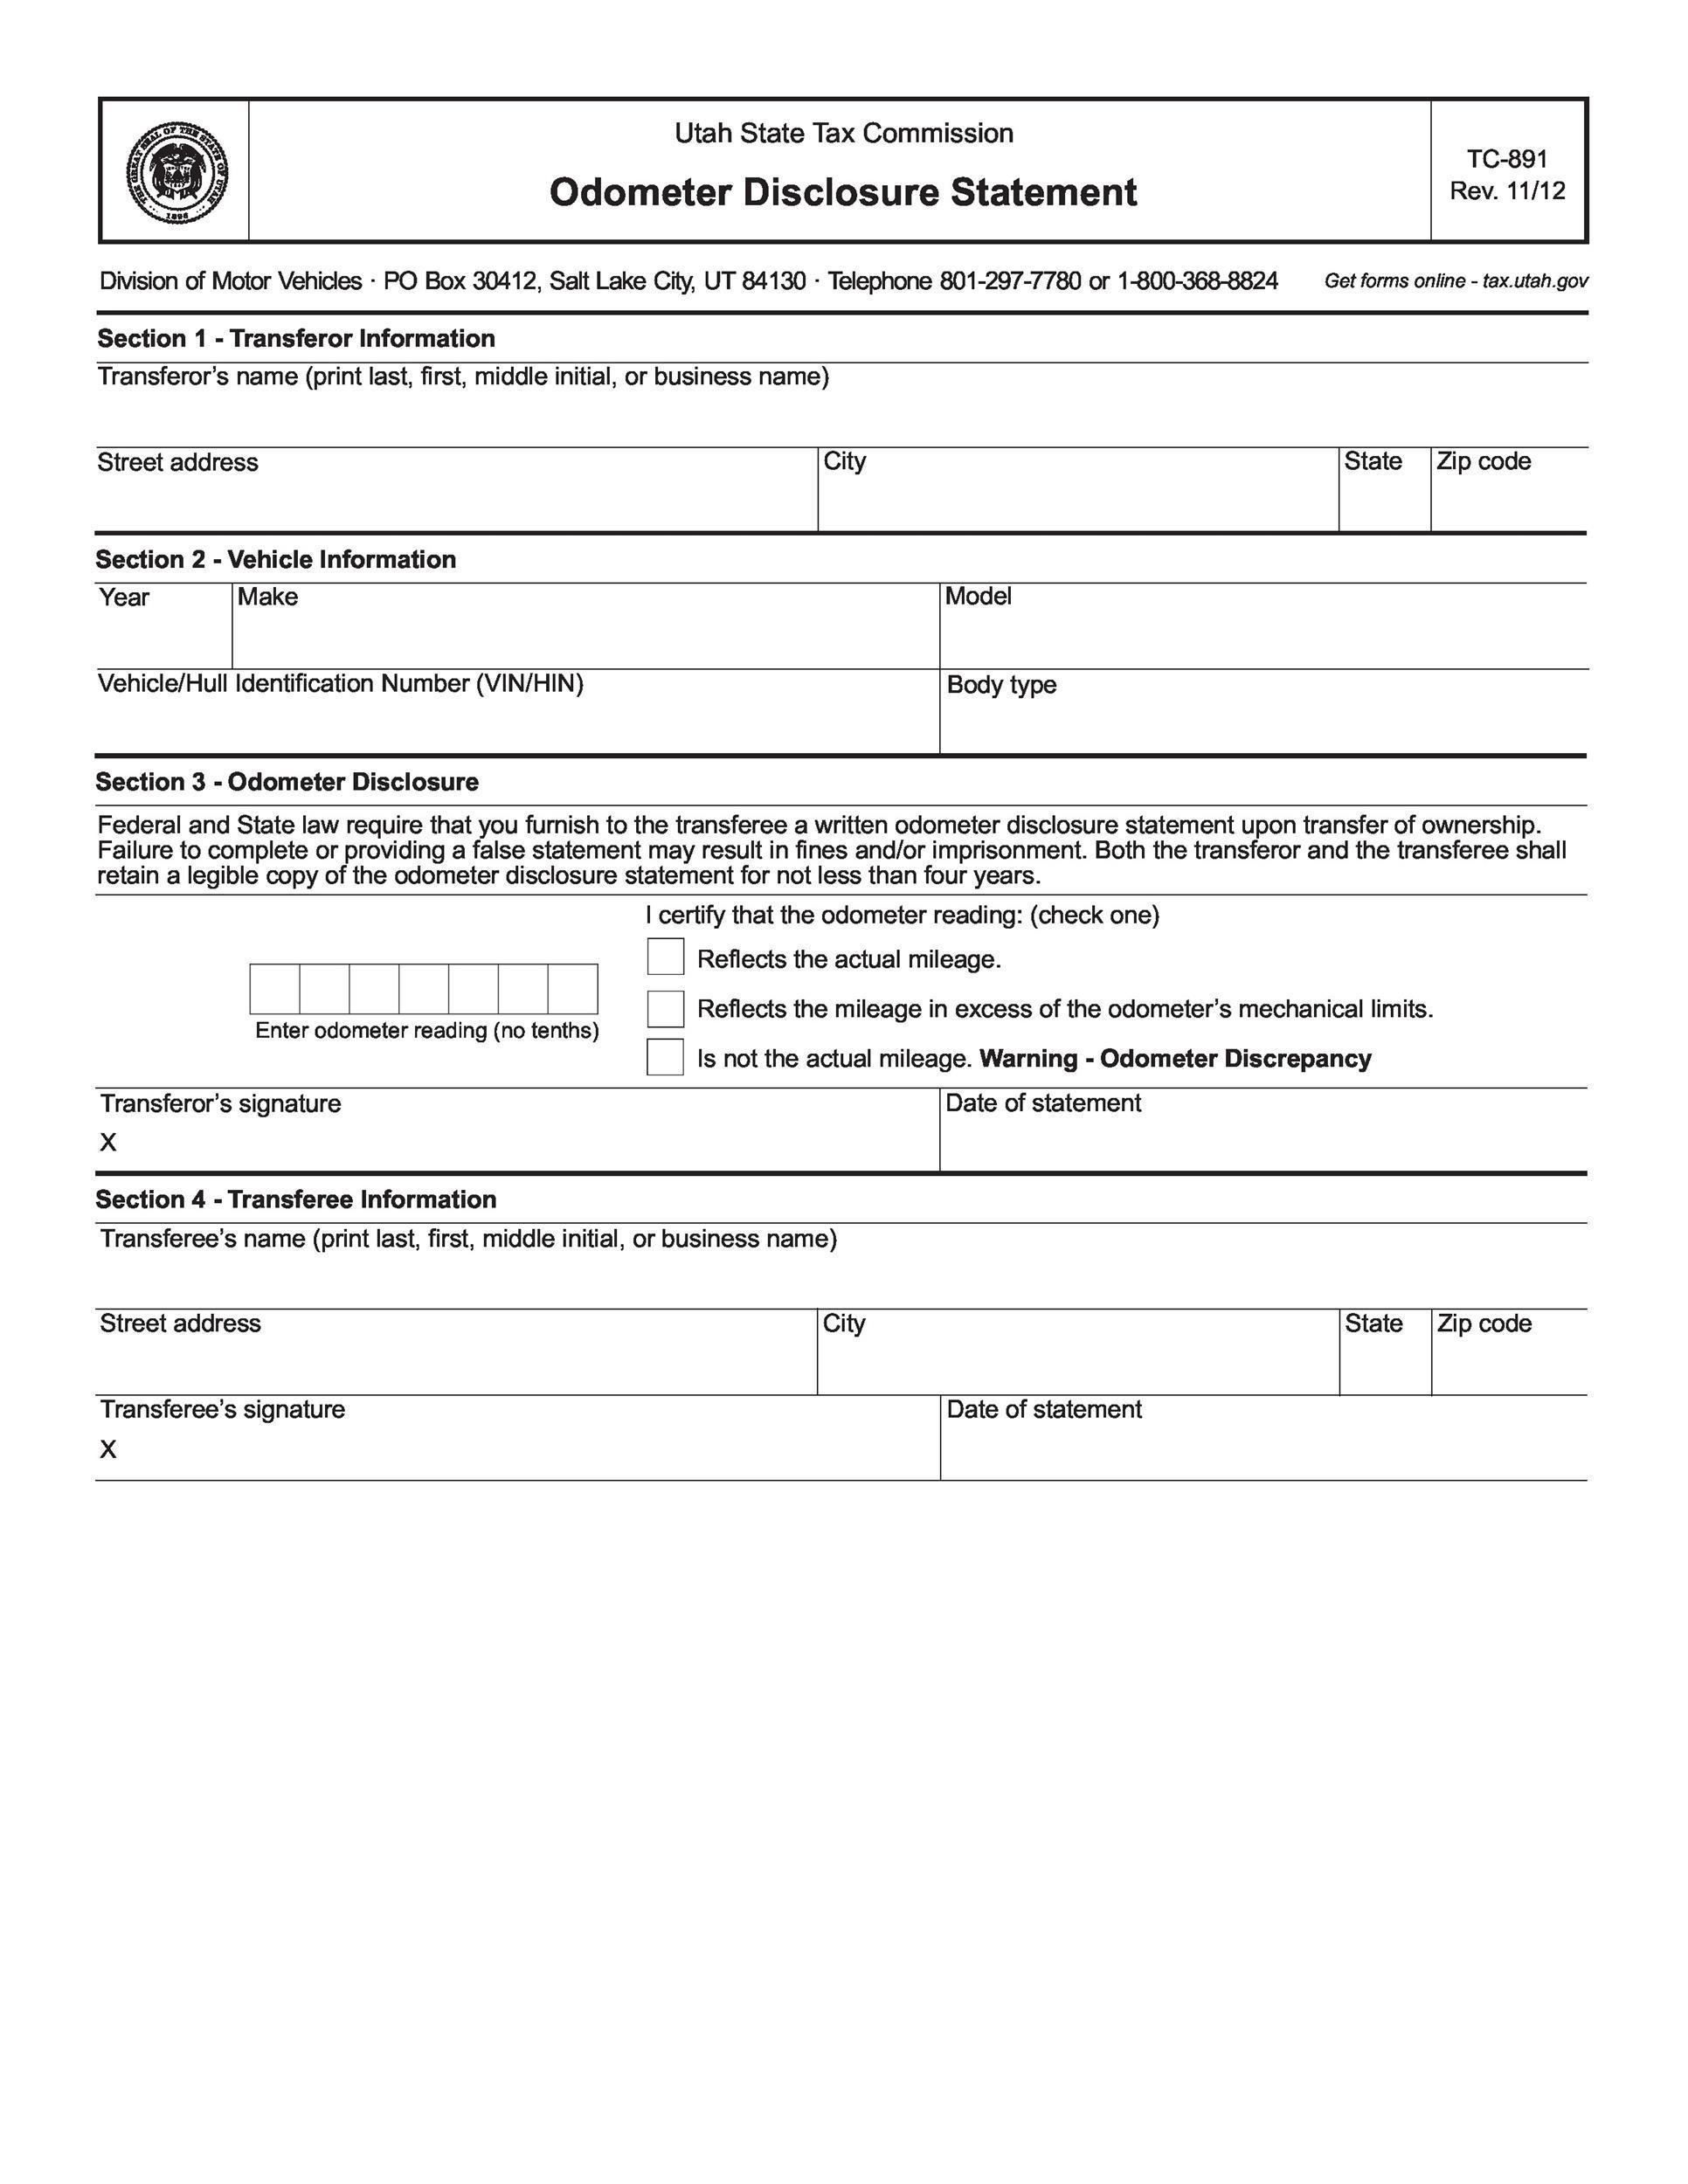 Free odometer disclosure statement 04